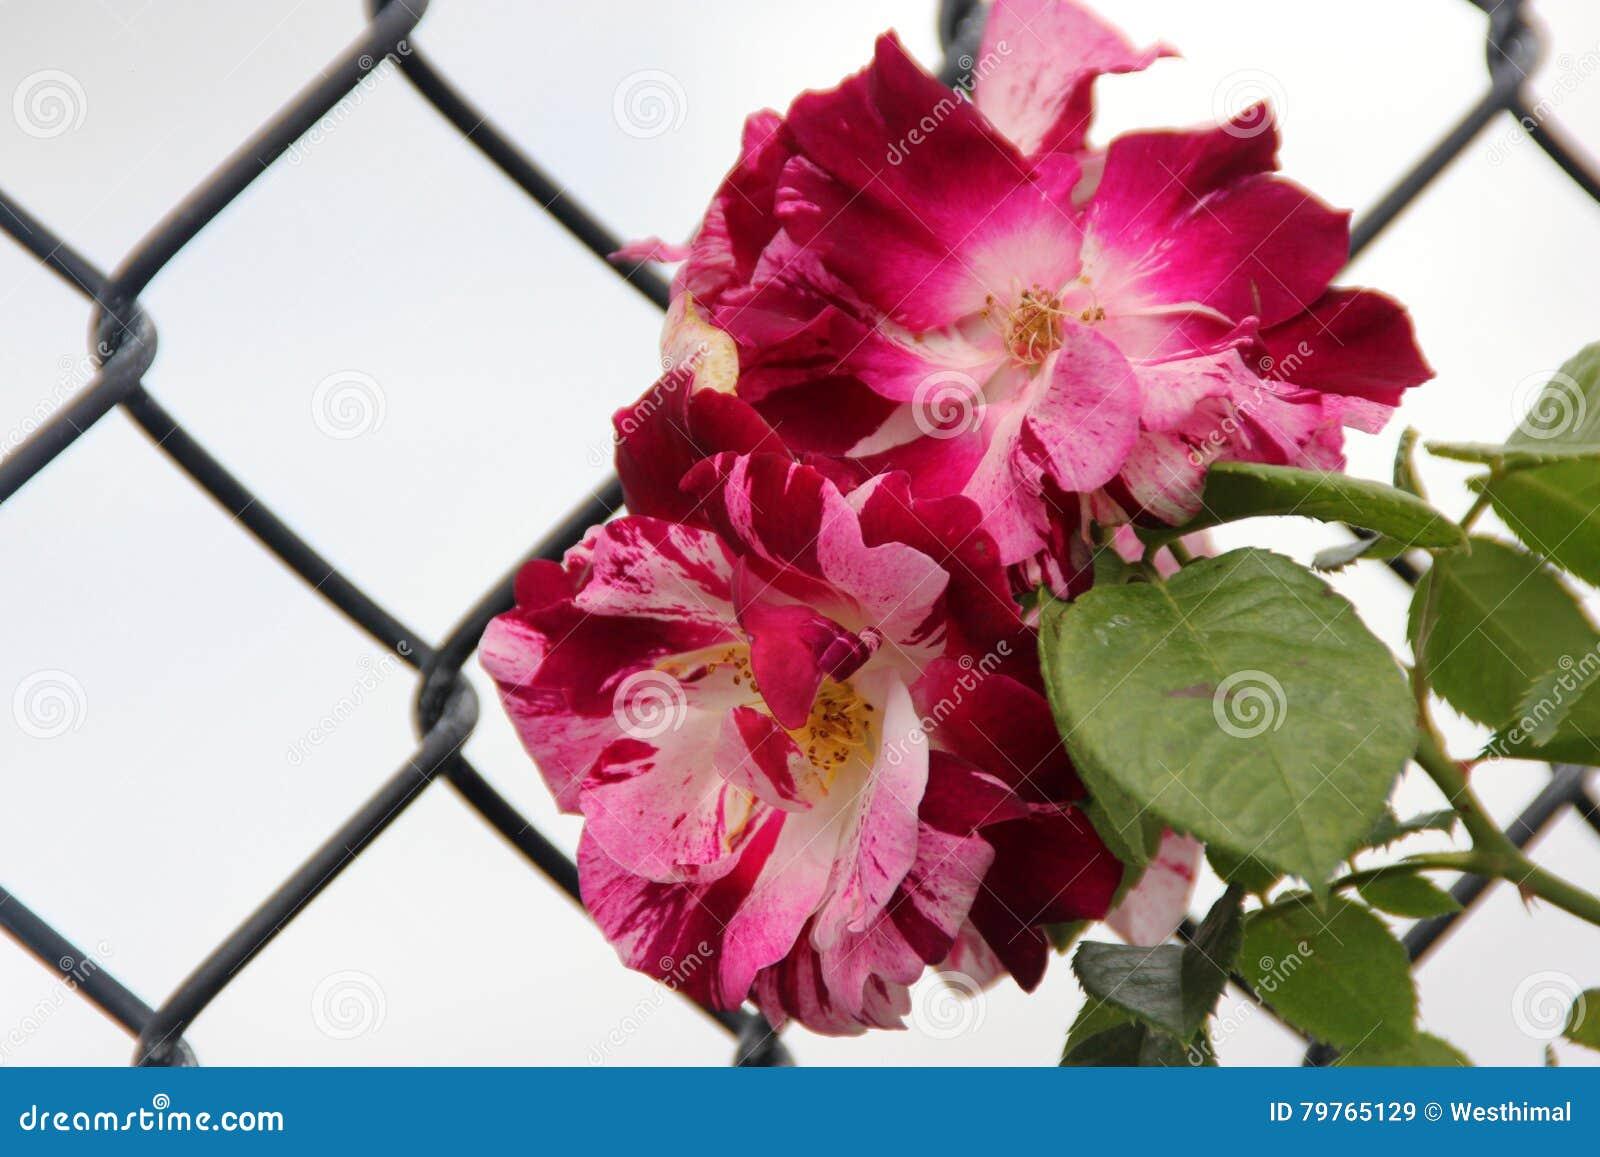 Rosa \'Purple Splash\' stock image. Image of golden, flowered - 79765129